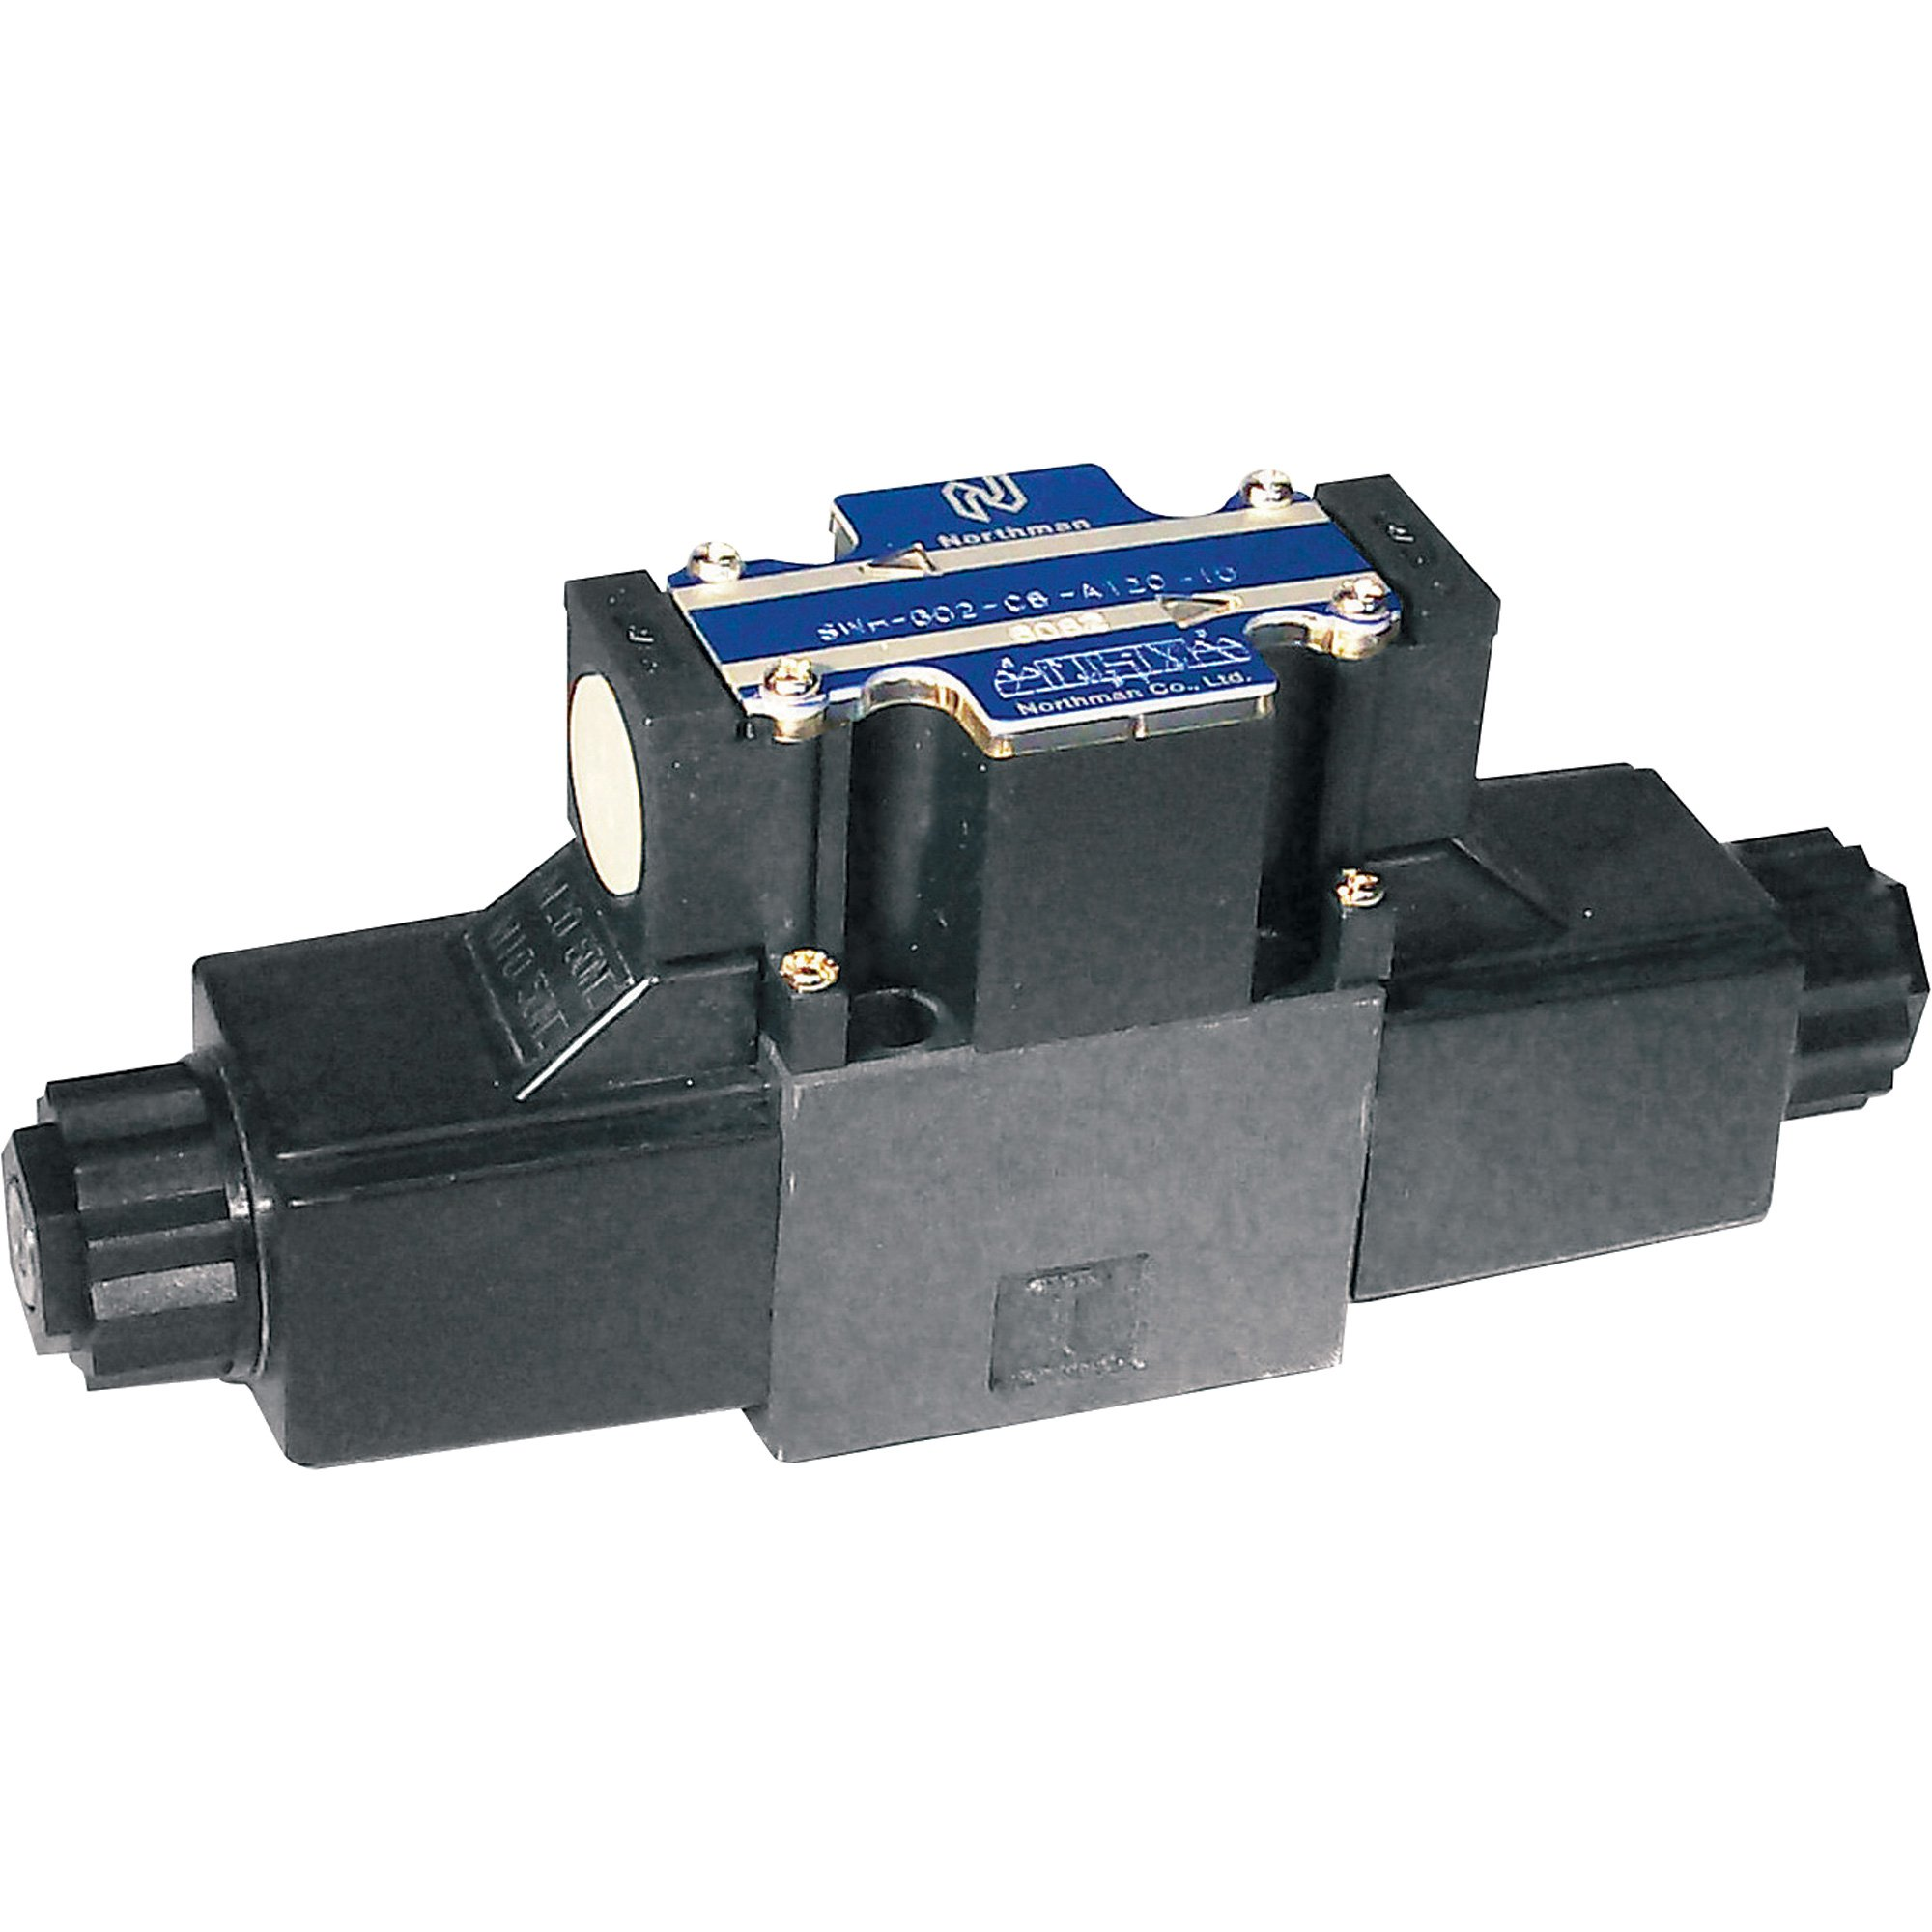 Northman Fluid Power Hydraulic Directional Control Valve - 10.7 GPM, 4500 PSI, 3-Position, Double Solenoid, Tandem Center Spool, 120 Volt AC Solenoids, Model# SWHG02C6R12010